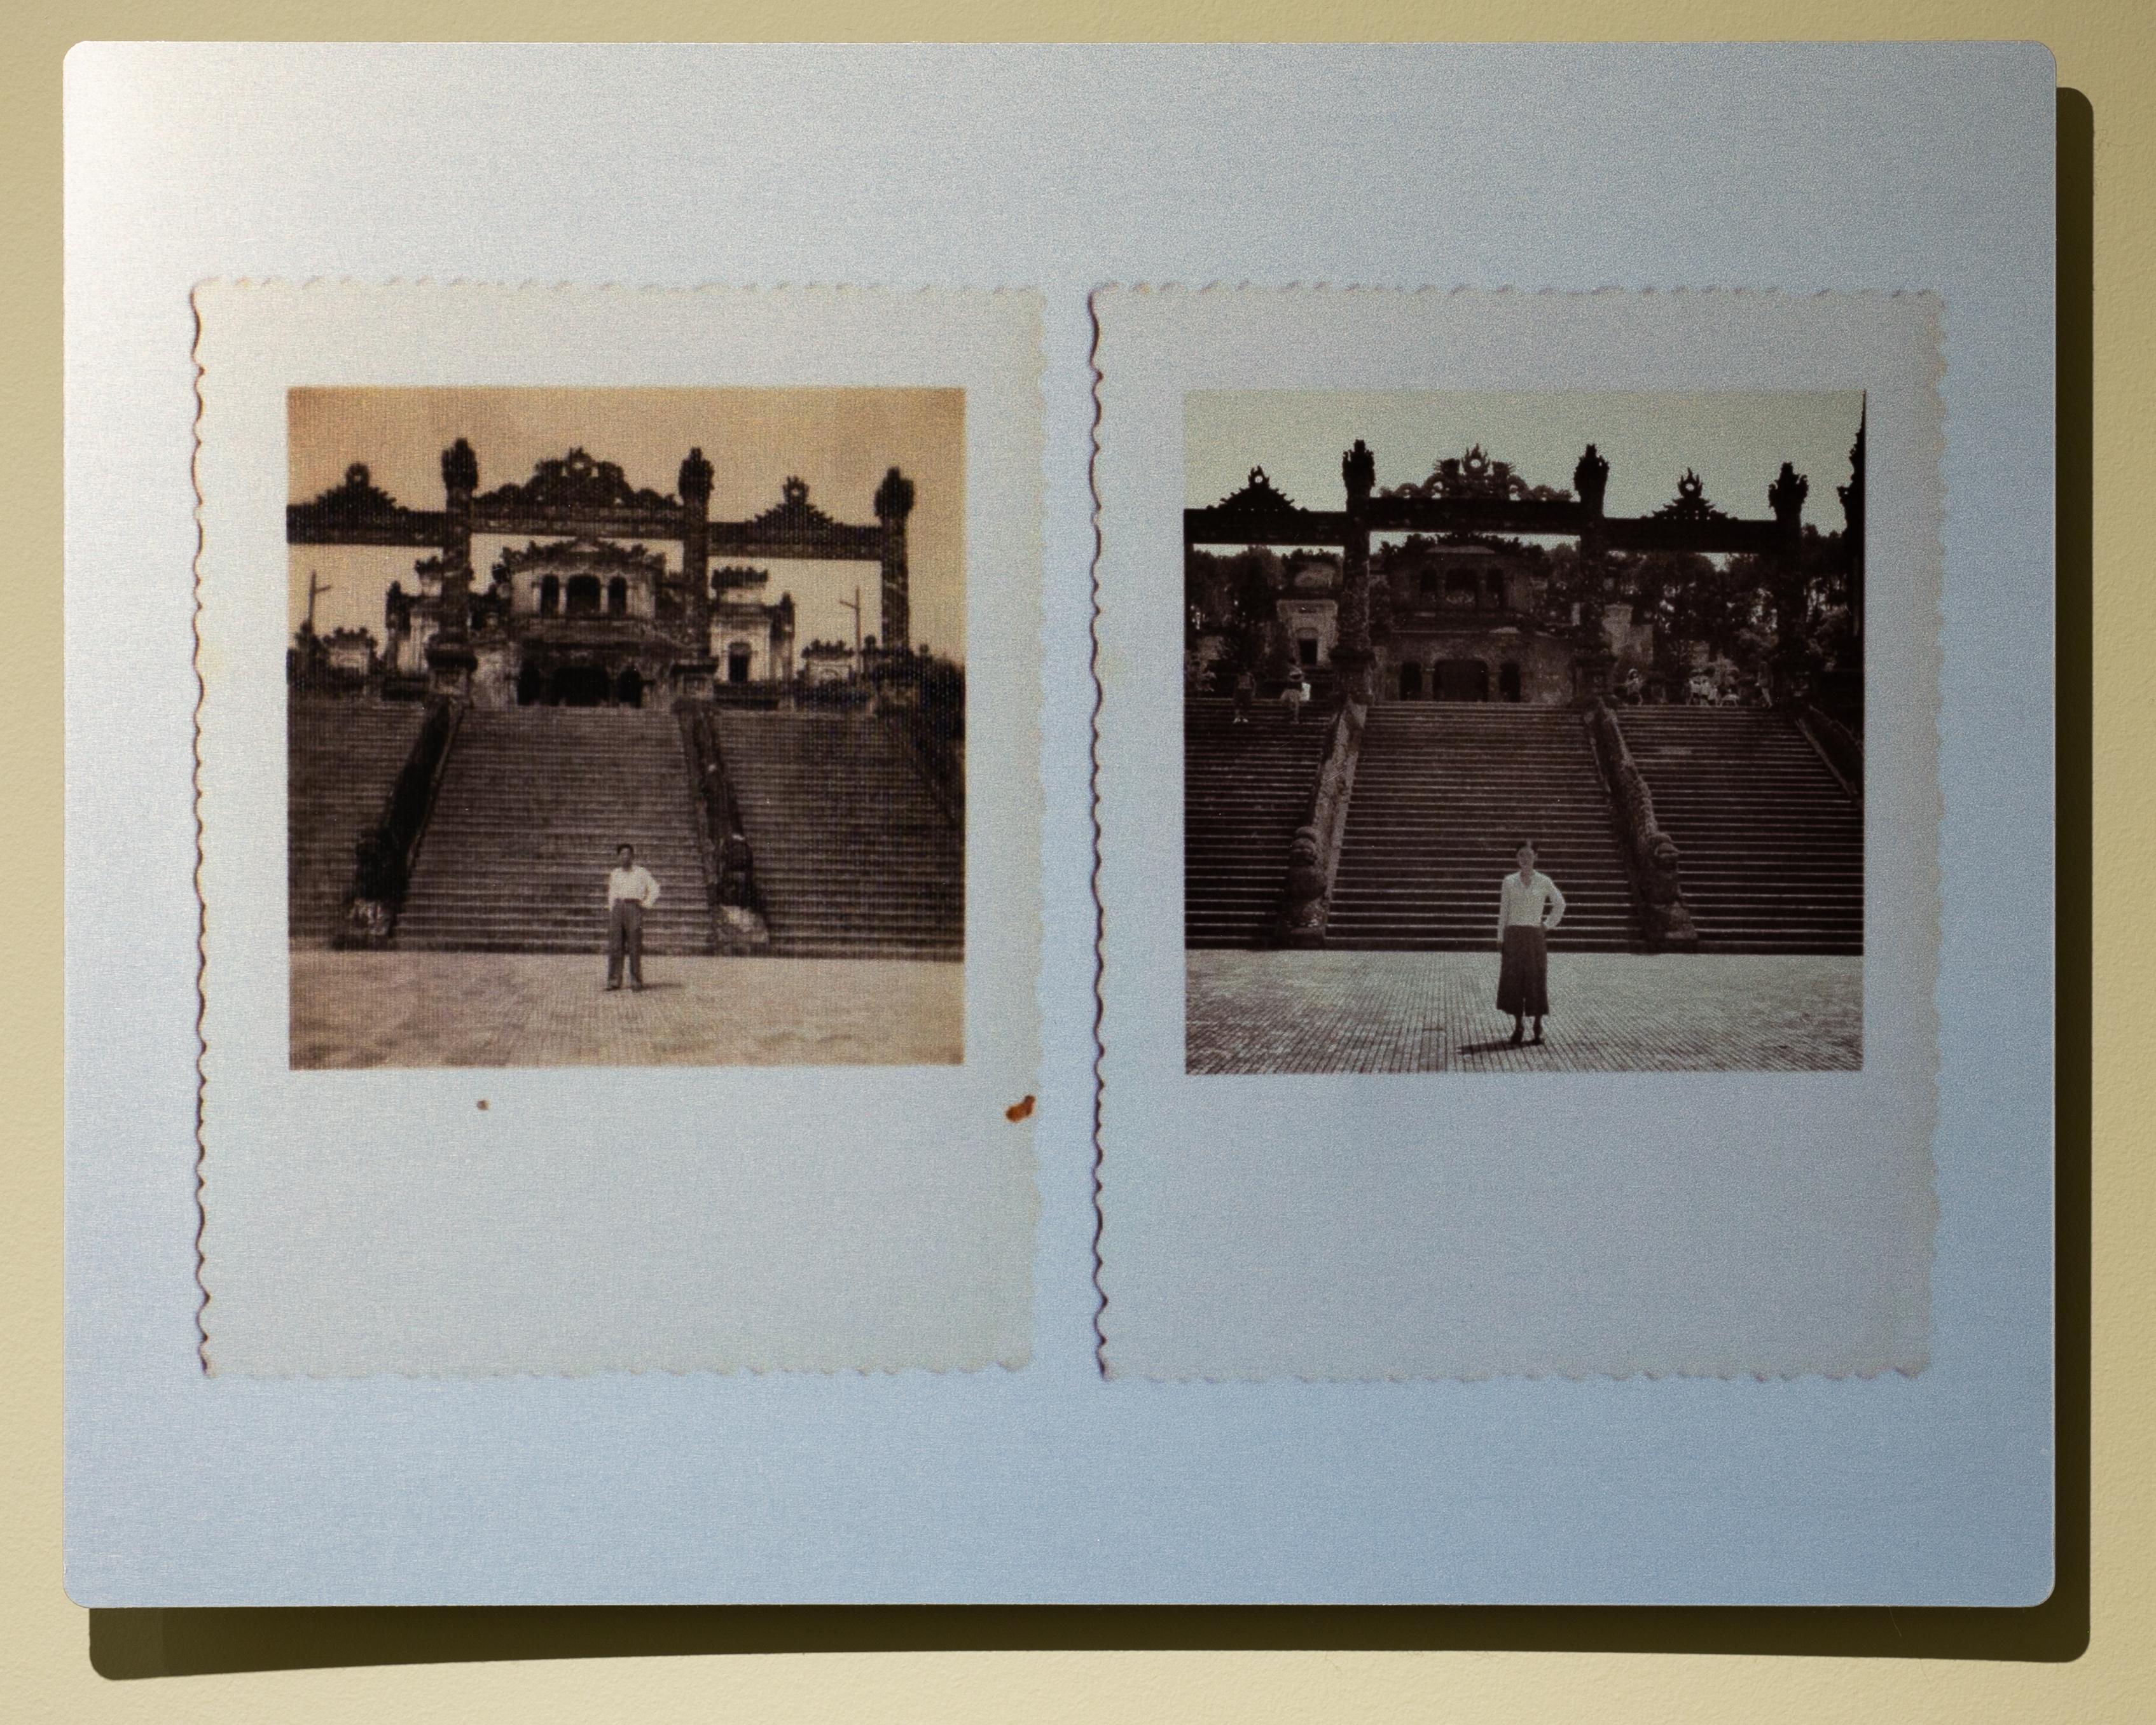 "Quynh Lam, 6 Khai Dinh Mausoleum, 11"" x 14"", recreation of old family photograph, aluminum print, 2018"